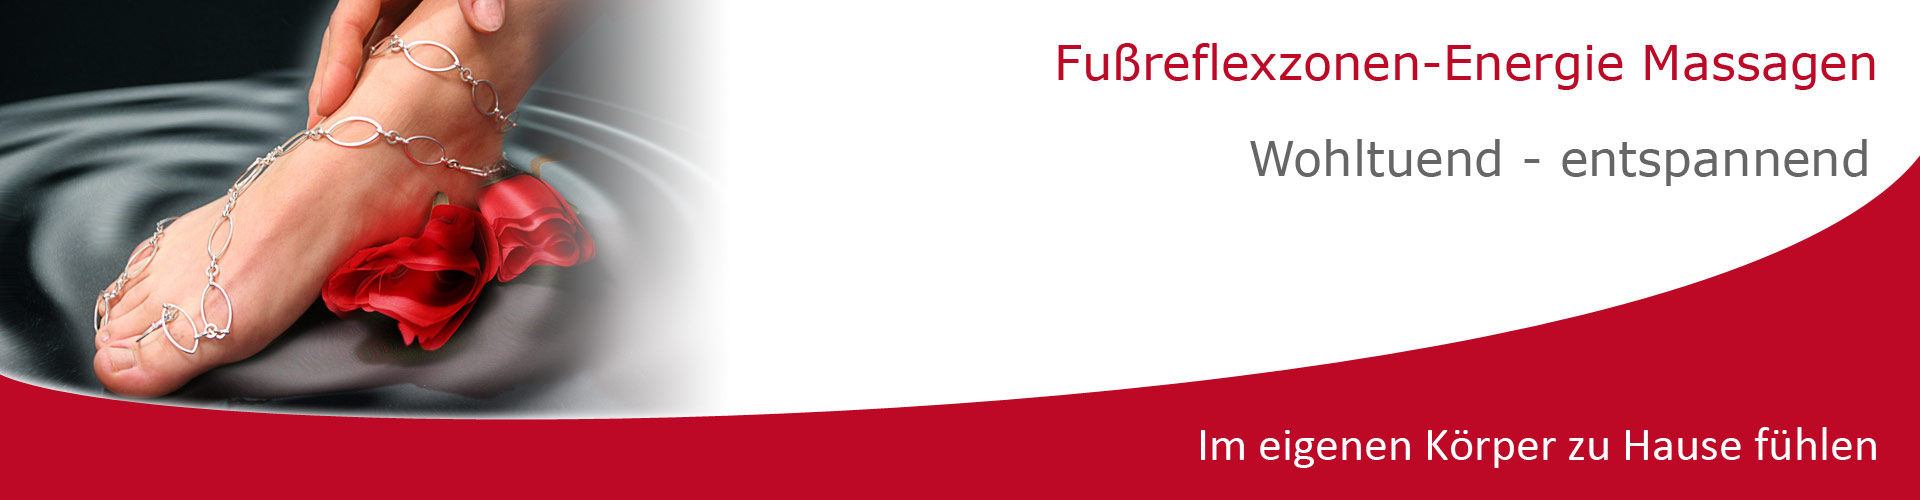 silke-joerns-fussreflexzonen2017-01